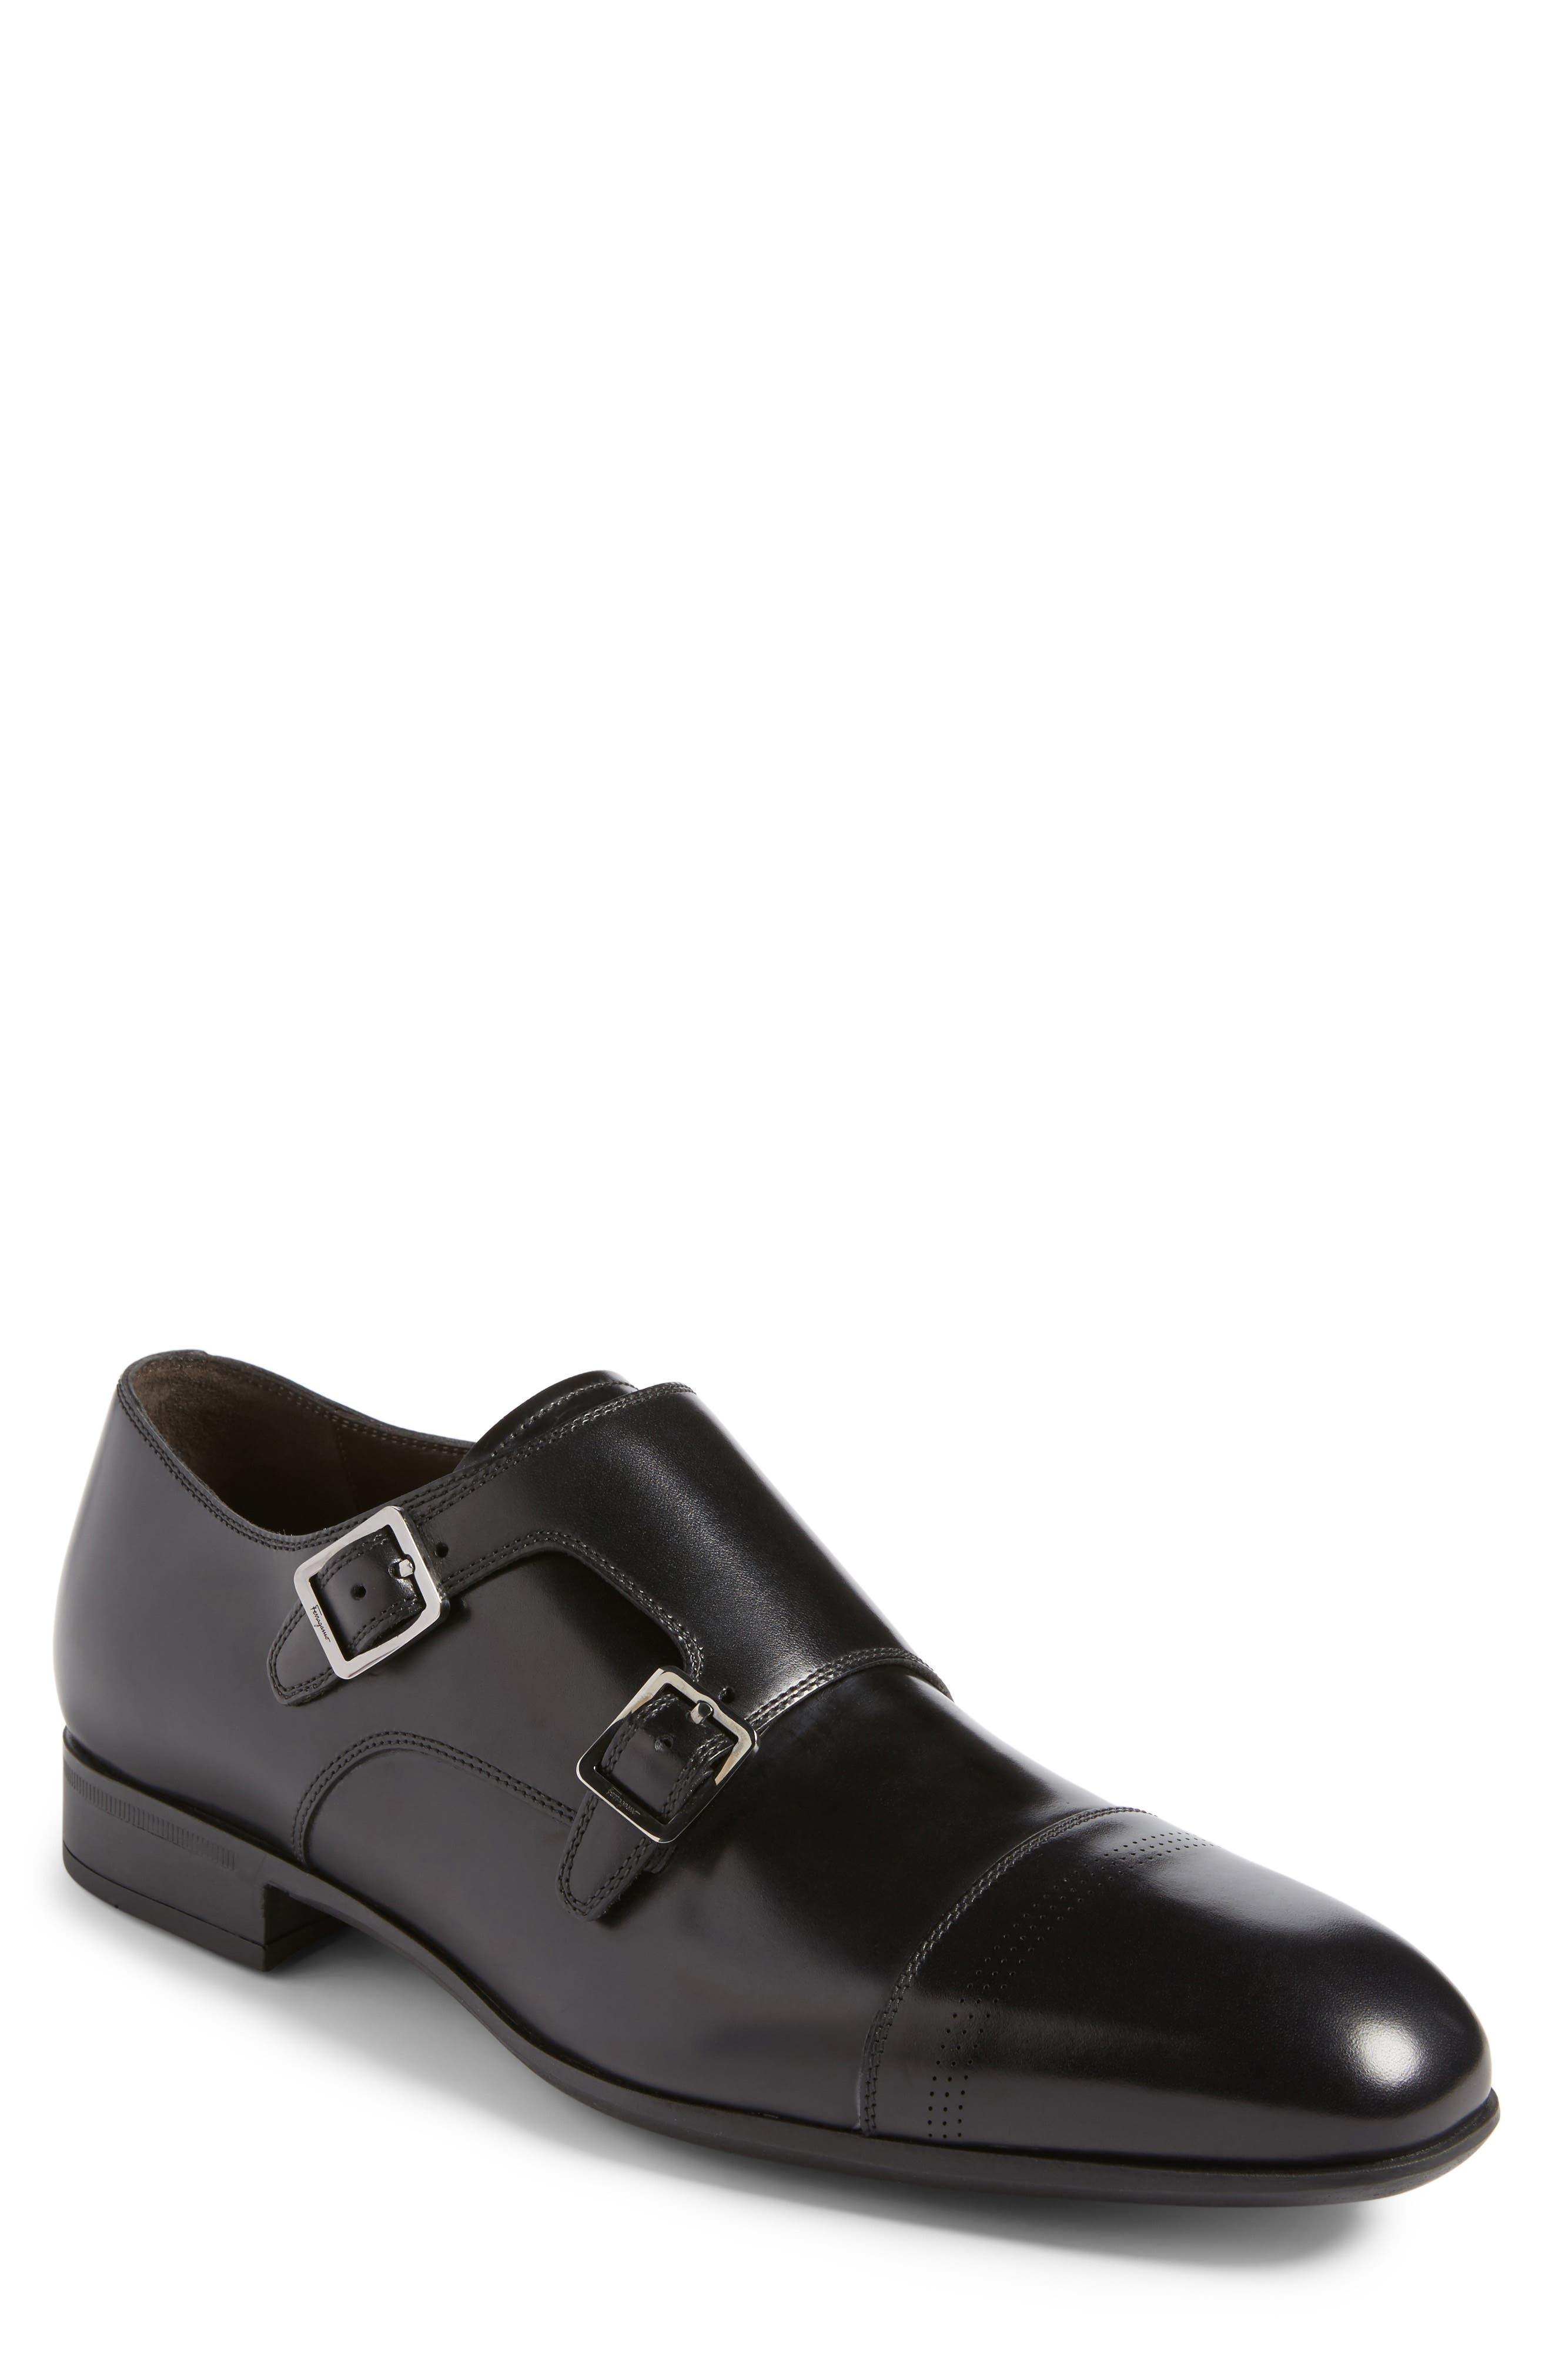 Ambre Mens Navar III lace Nubuck Shoe Black 45 Ekmn2lIUU5